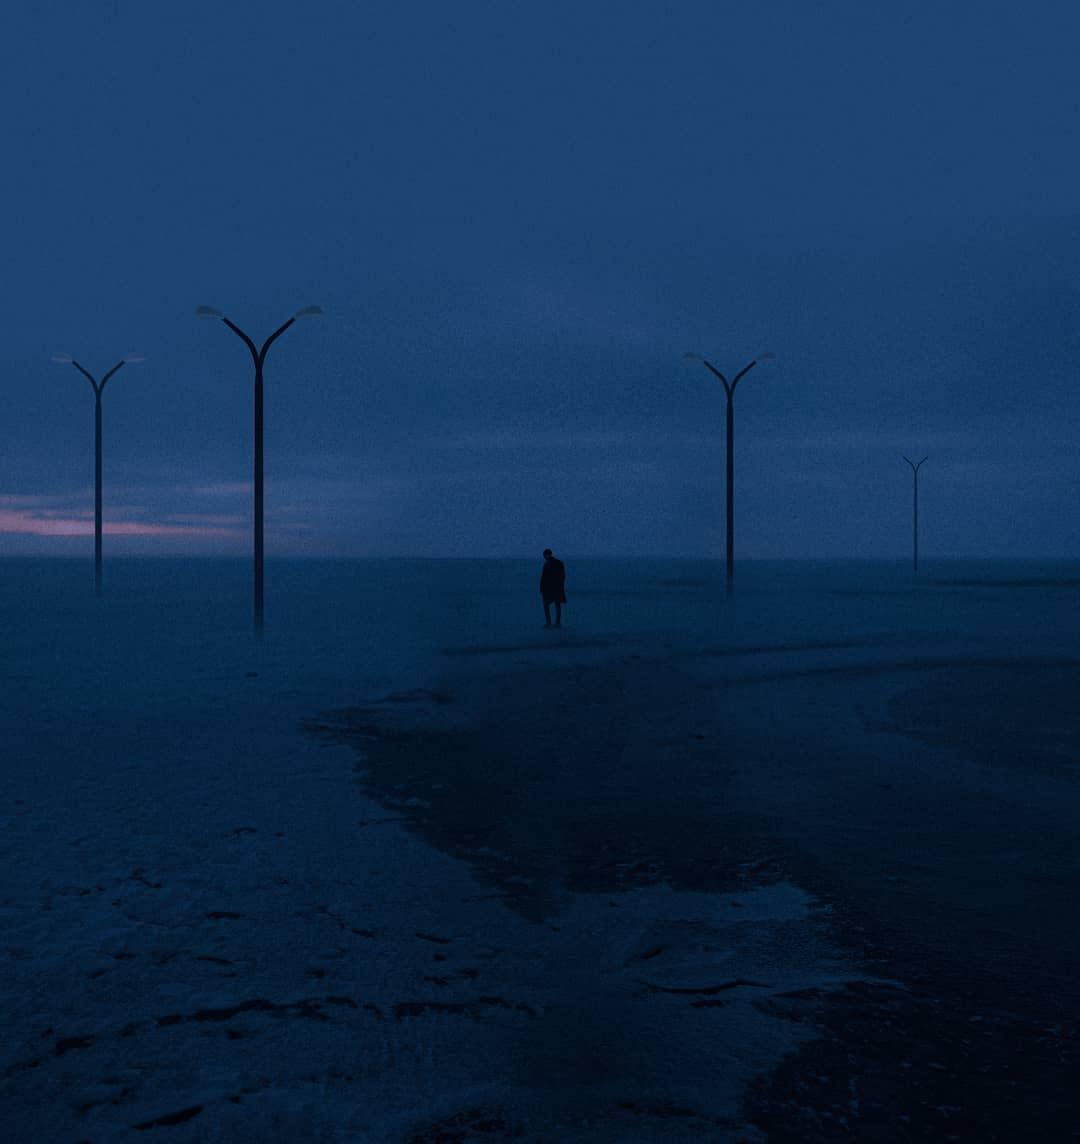 solitude, lampadaires et océan